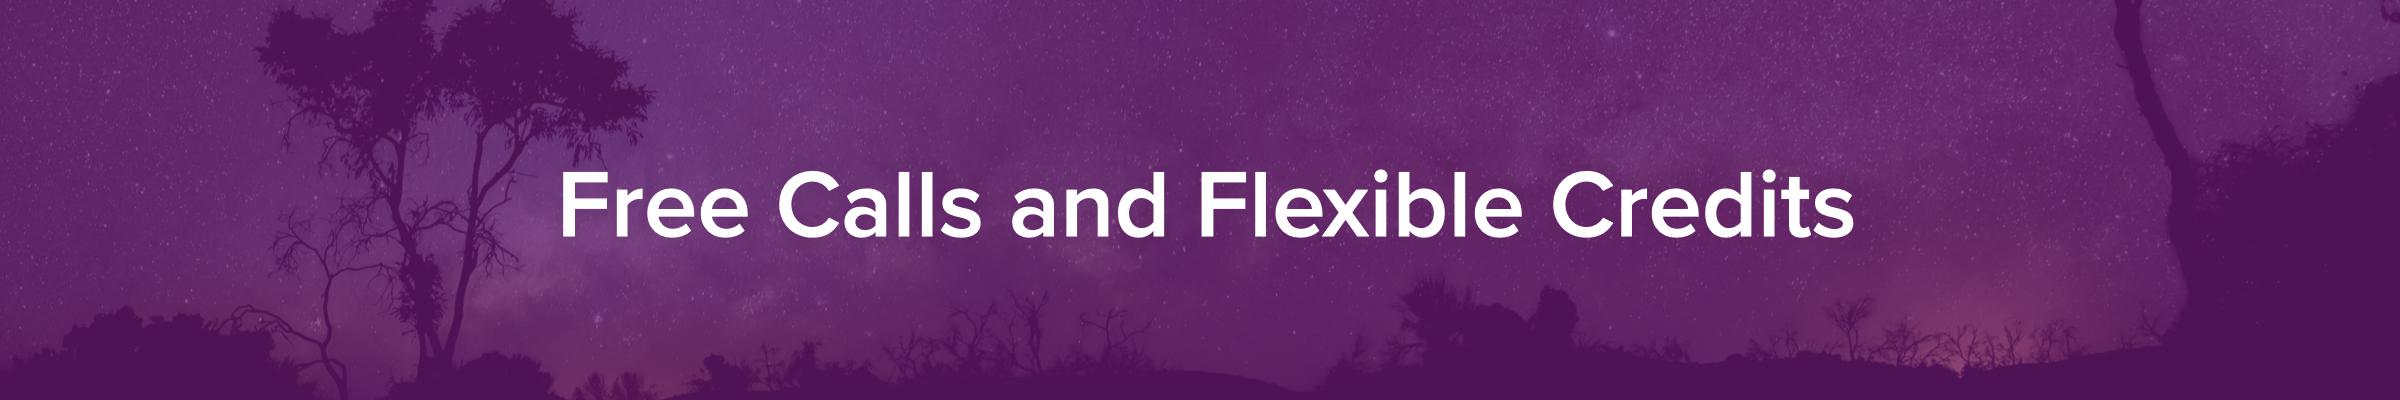 free calls and flexible credits